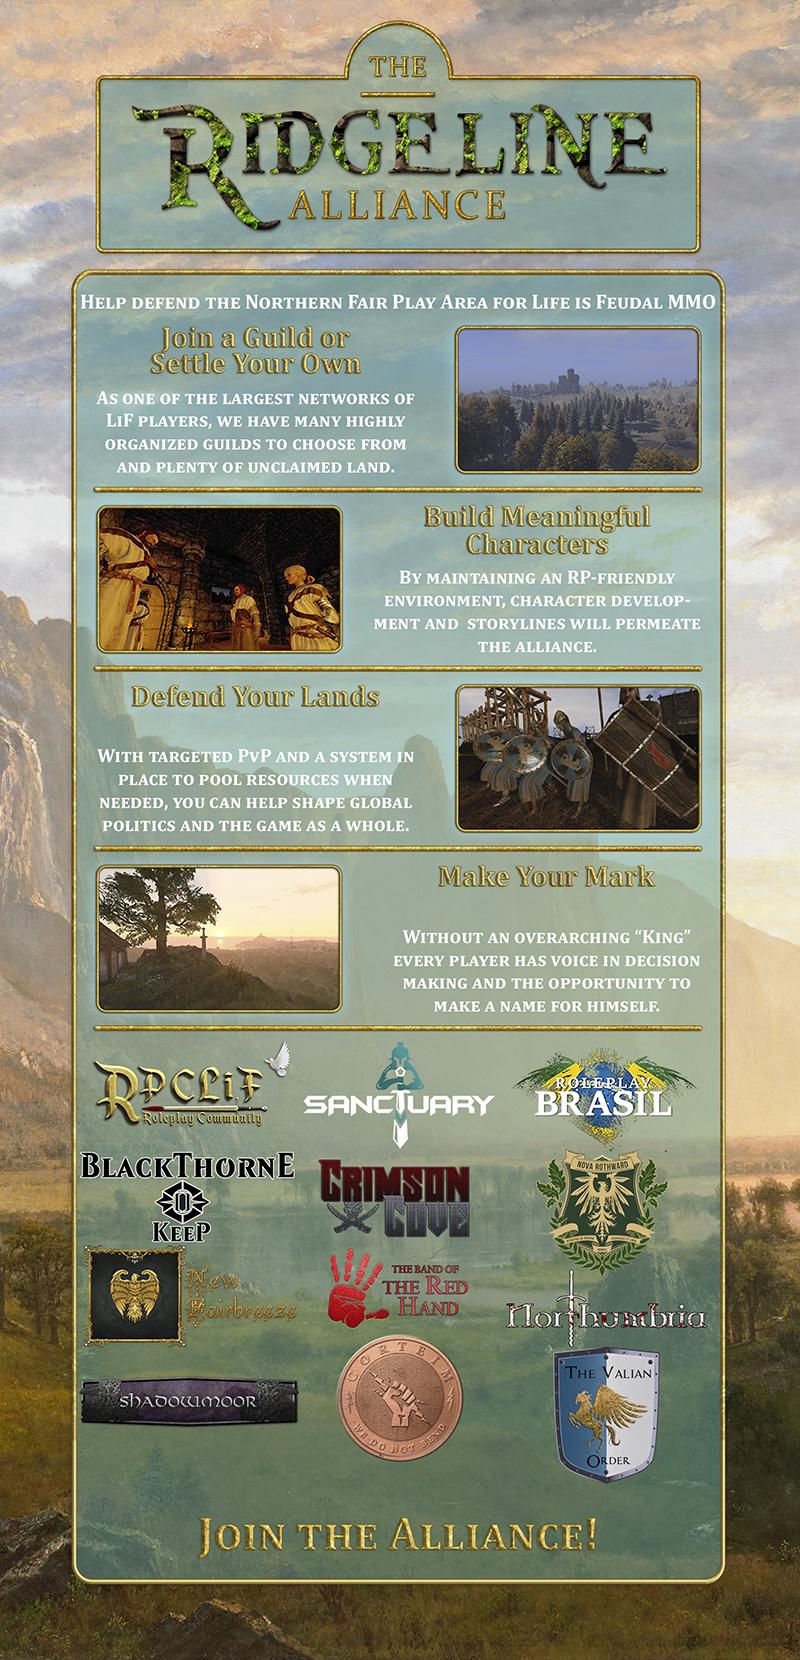 Ridgeline_Alliance_Poster_800px_f01.jpg